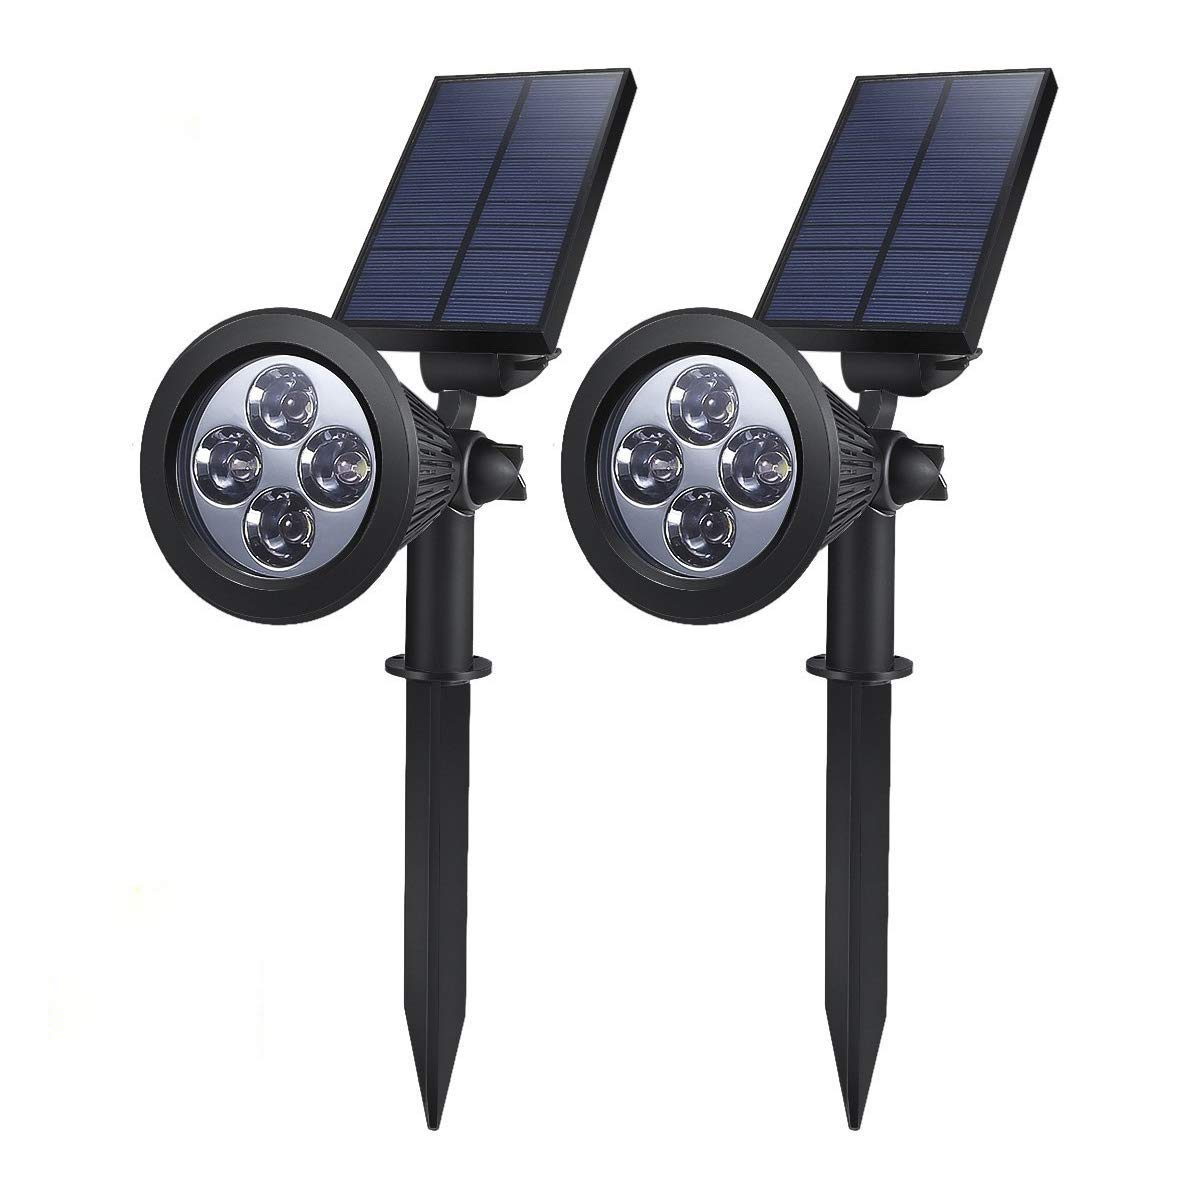 Solar Powered LED Garden Spotlight, ProGreen 2-in-1 Waterproof 4 LED Solar Spotlight Adjustable Landscape Solar Lighting Wall Light for Outdoor Garden Decorations (2 Pack, 6000K Neutral White)